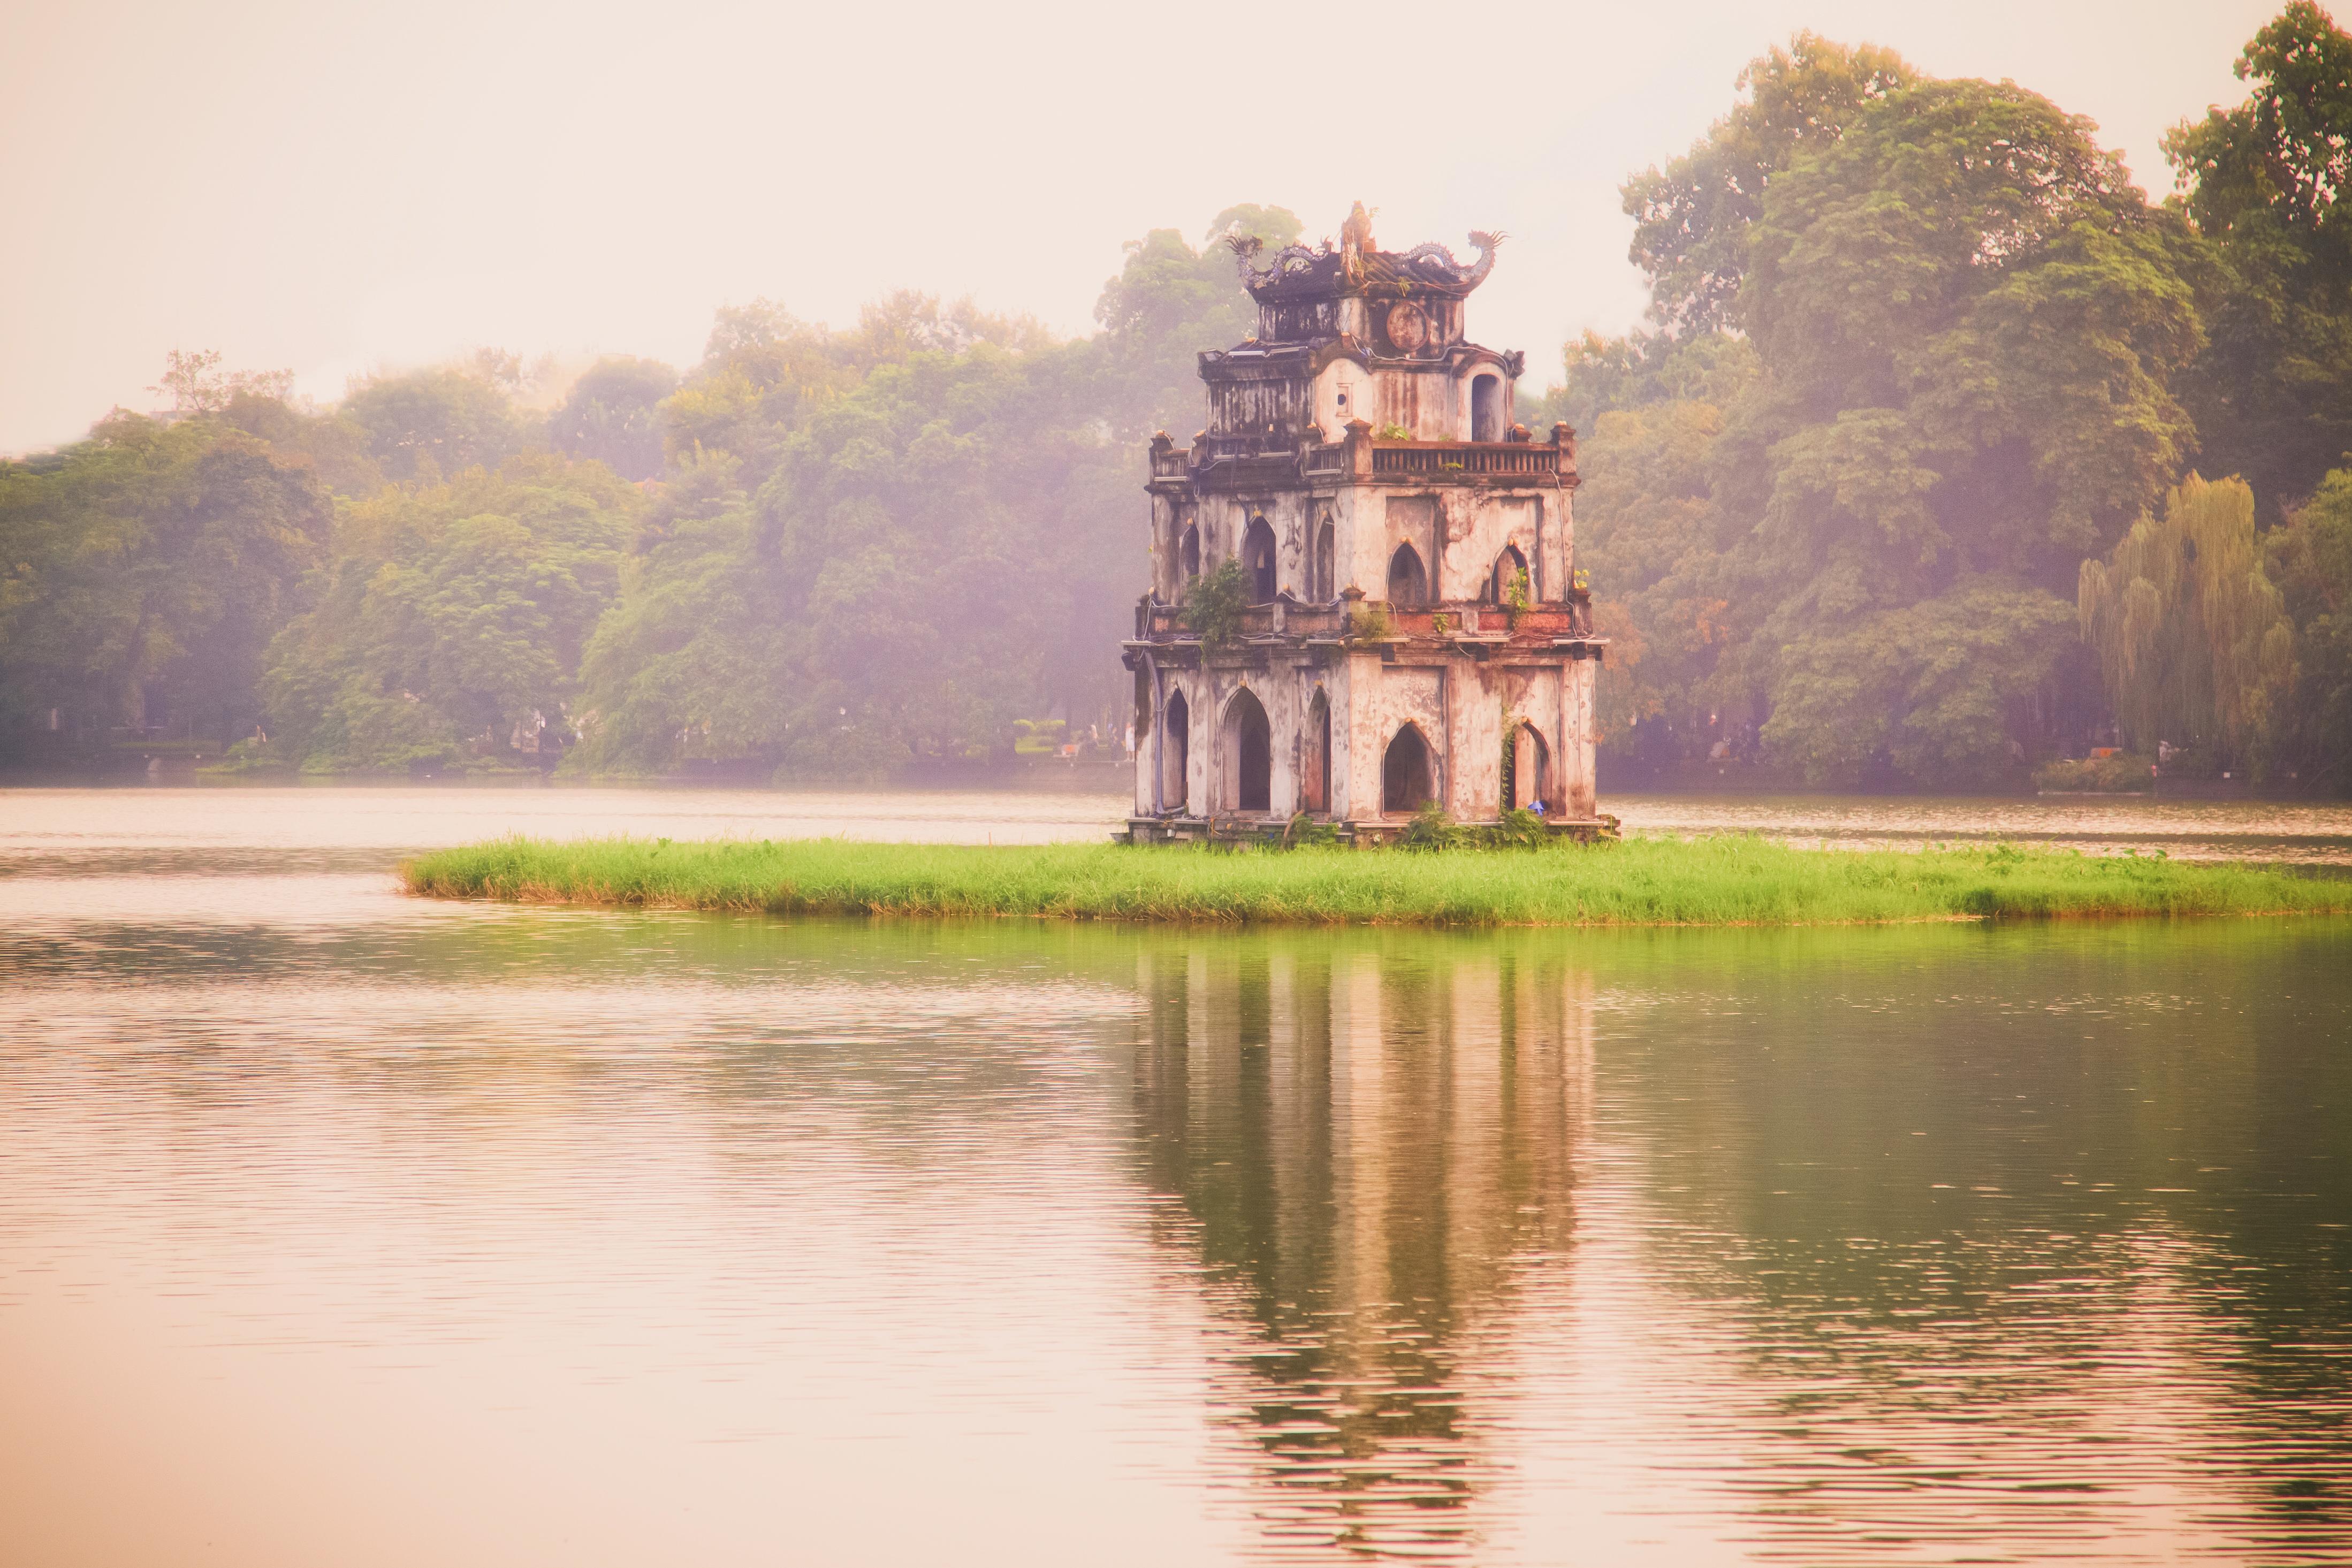 hoan kiem lake hanoi vietnam attractions lonely planet. Black Bedroom Furniture Sets. Home Design Ideas